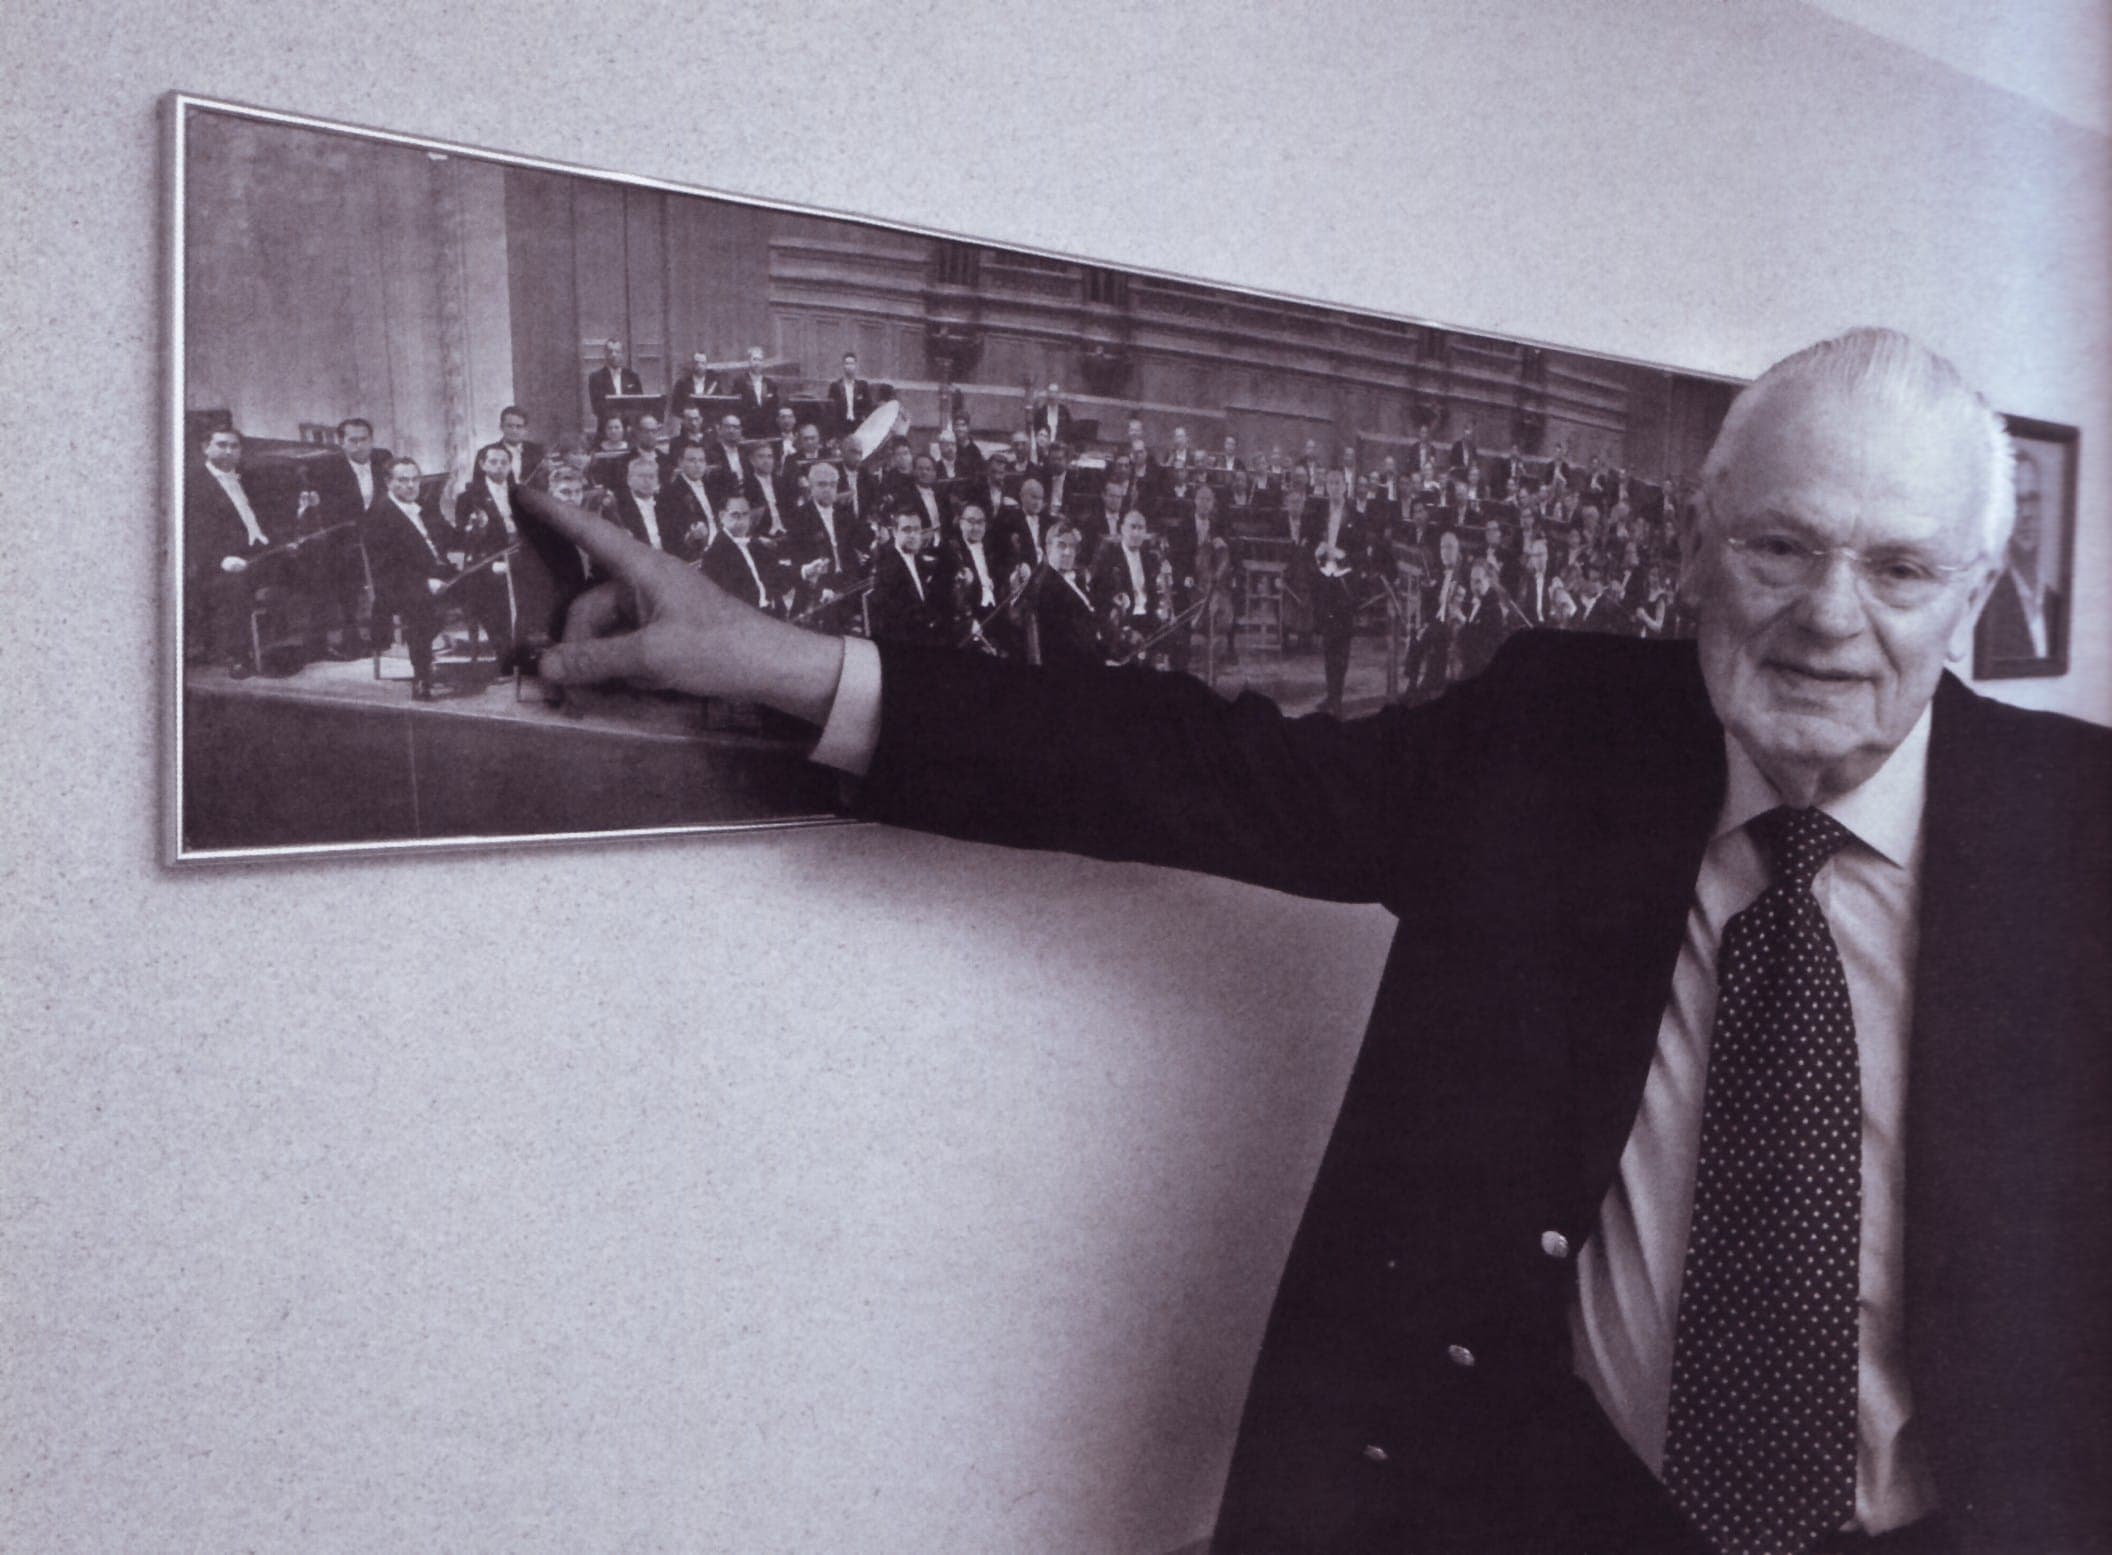 Роберт Бушков и фотография Госоркестра